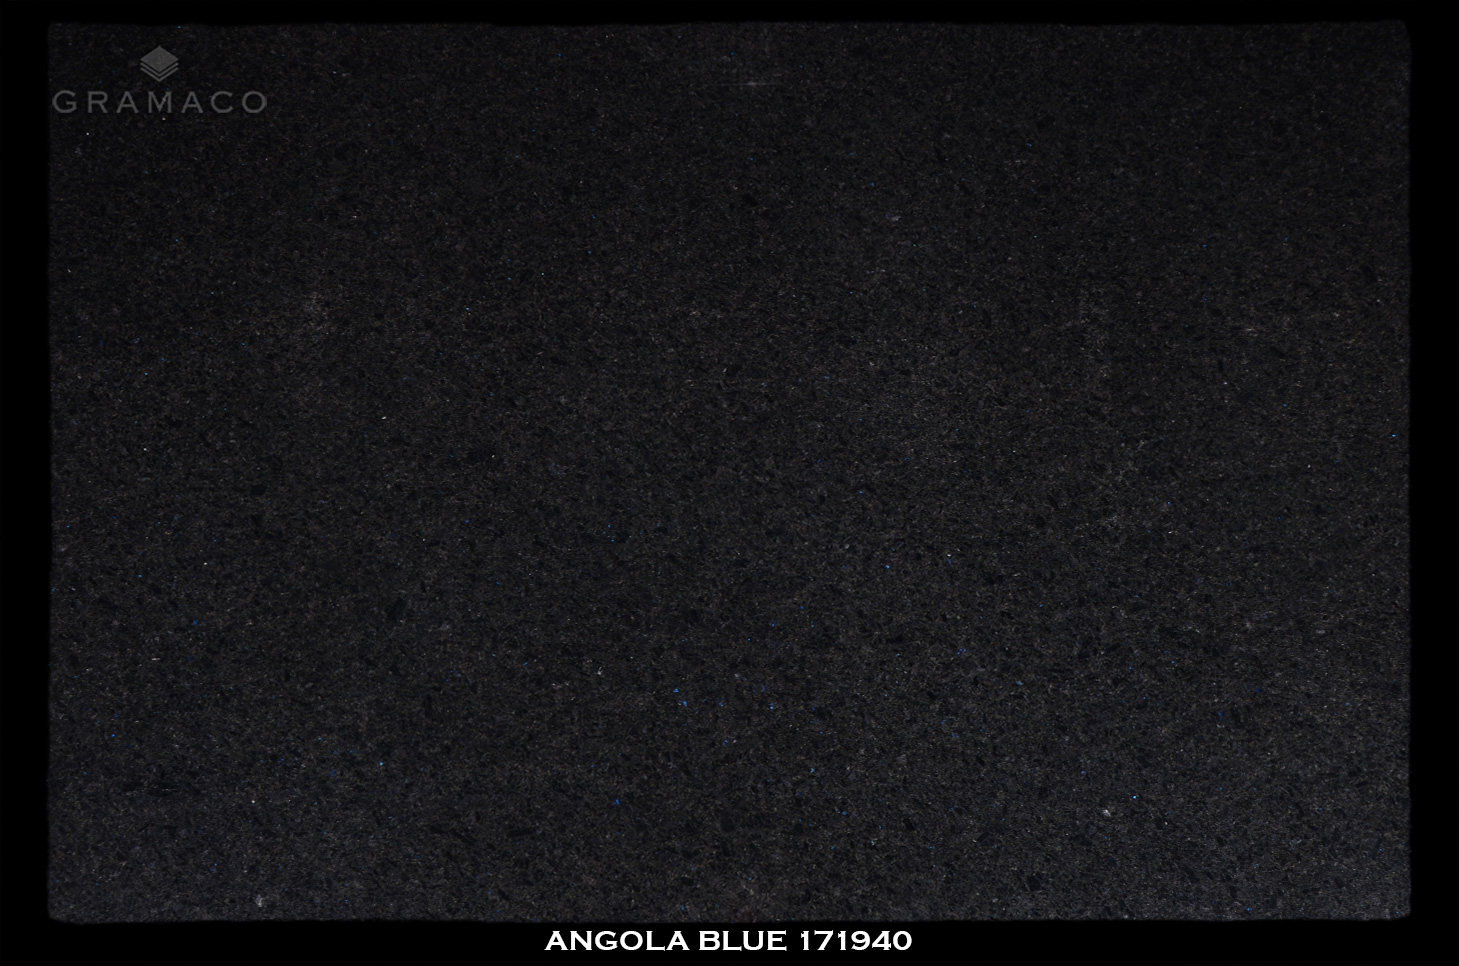 angola_blue171940-slab